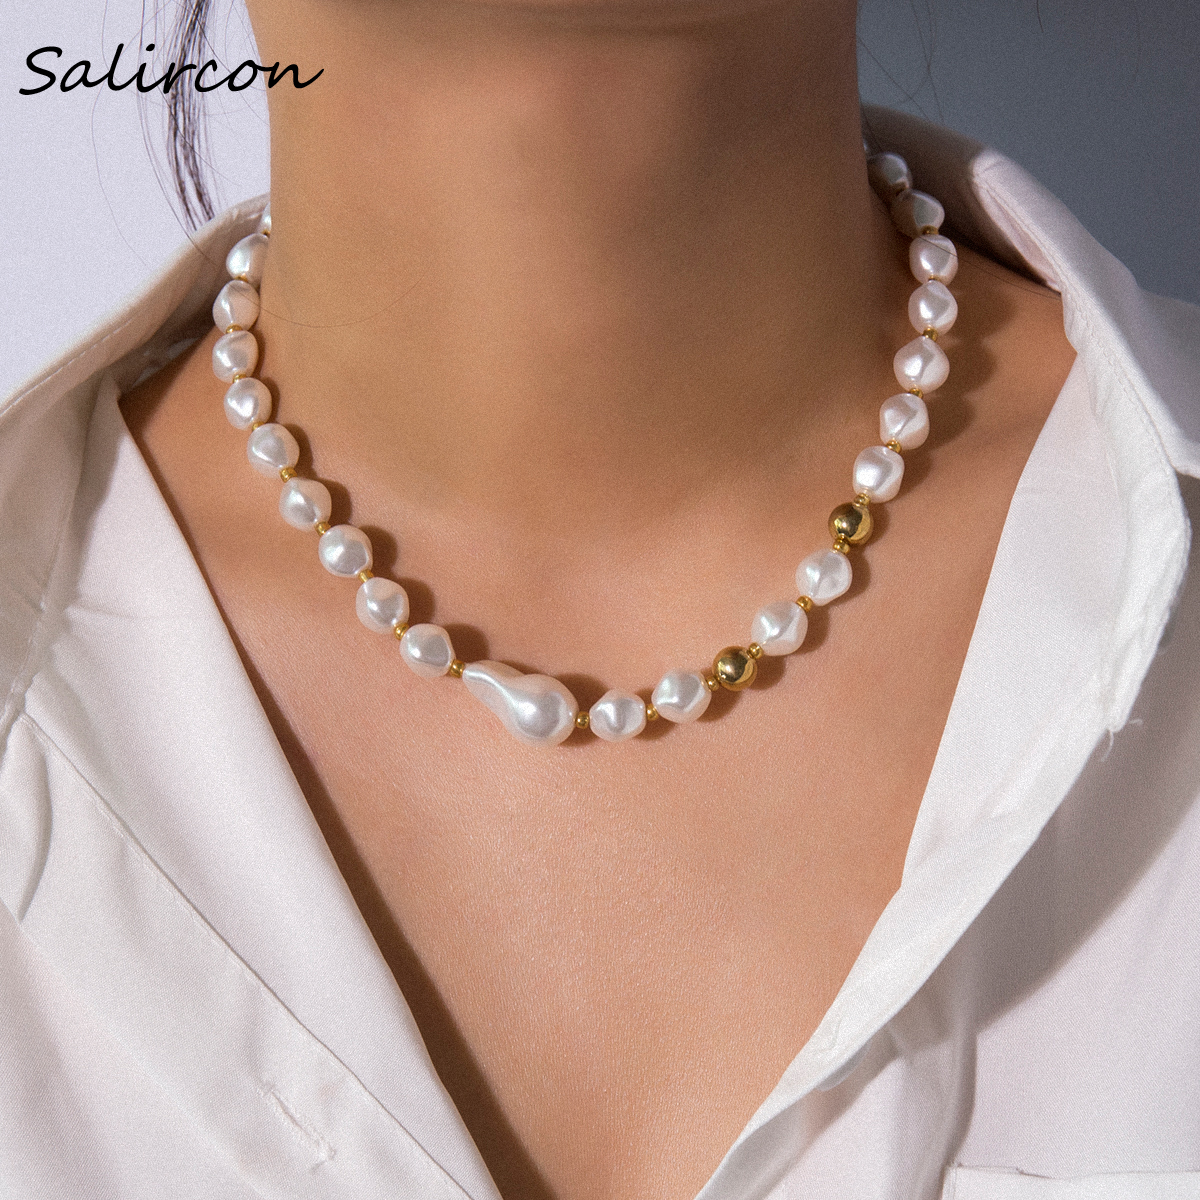 SalirCon Bohemian Elegant White Imitation Pearl Chain Necklace Clavicle Short Alloy Bead Women Party